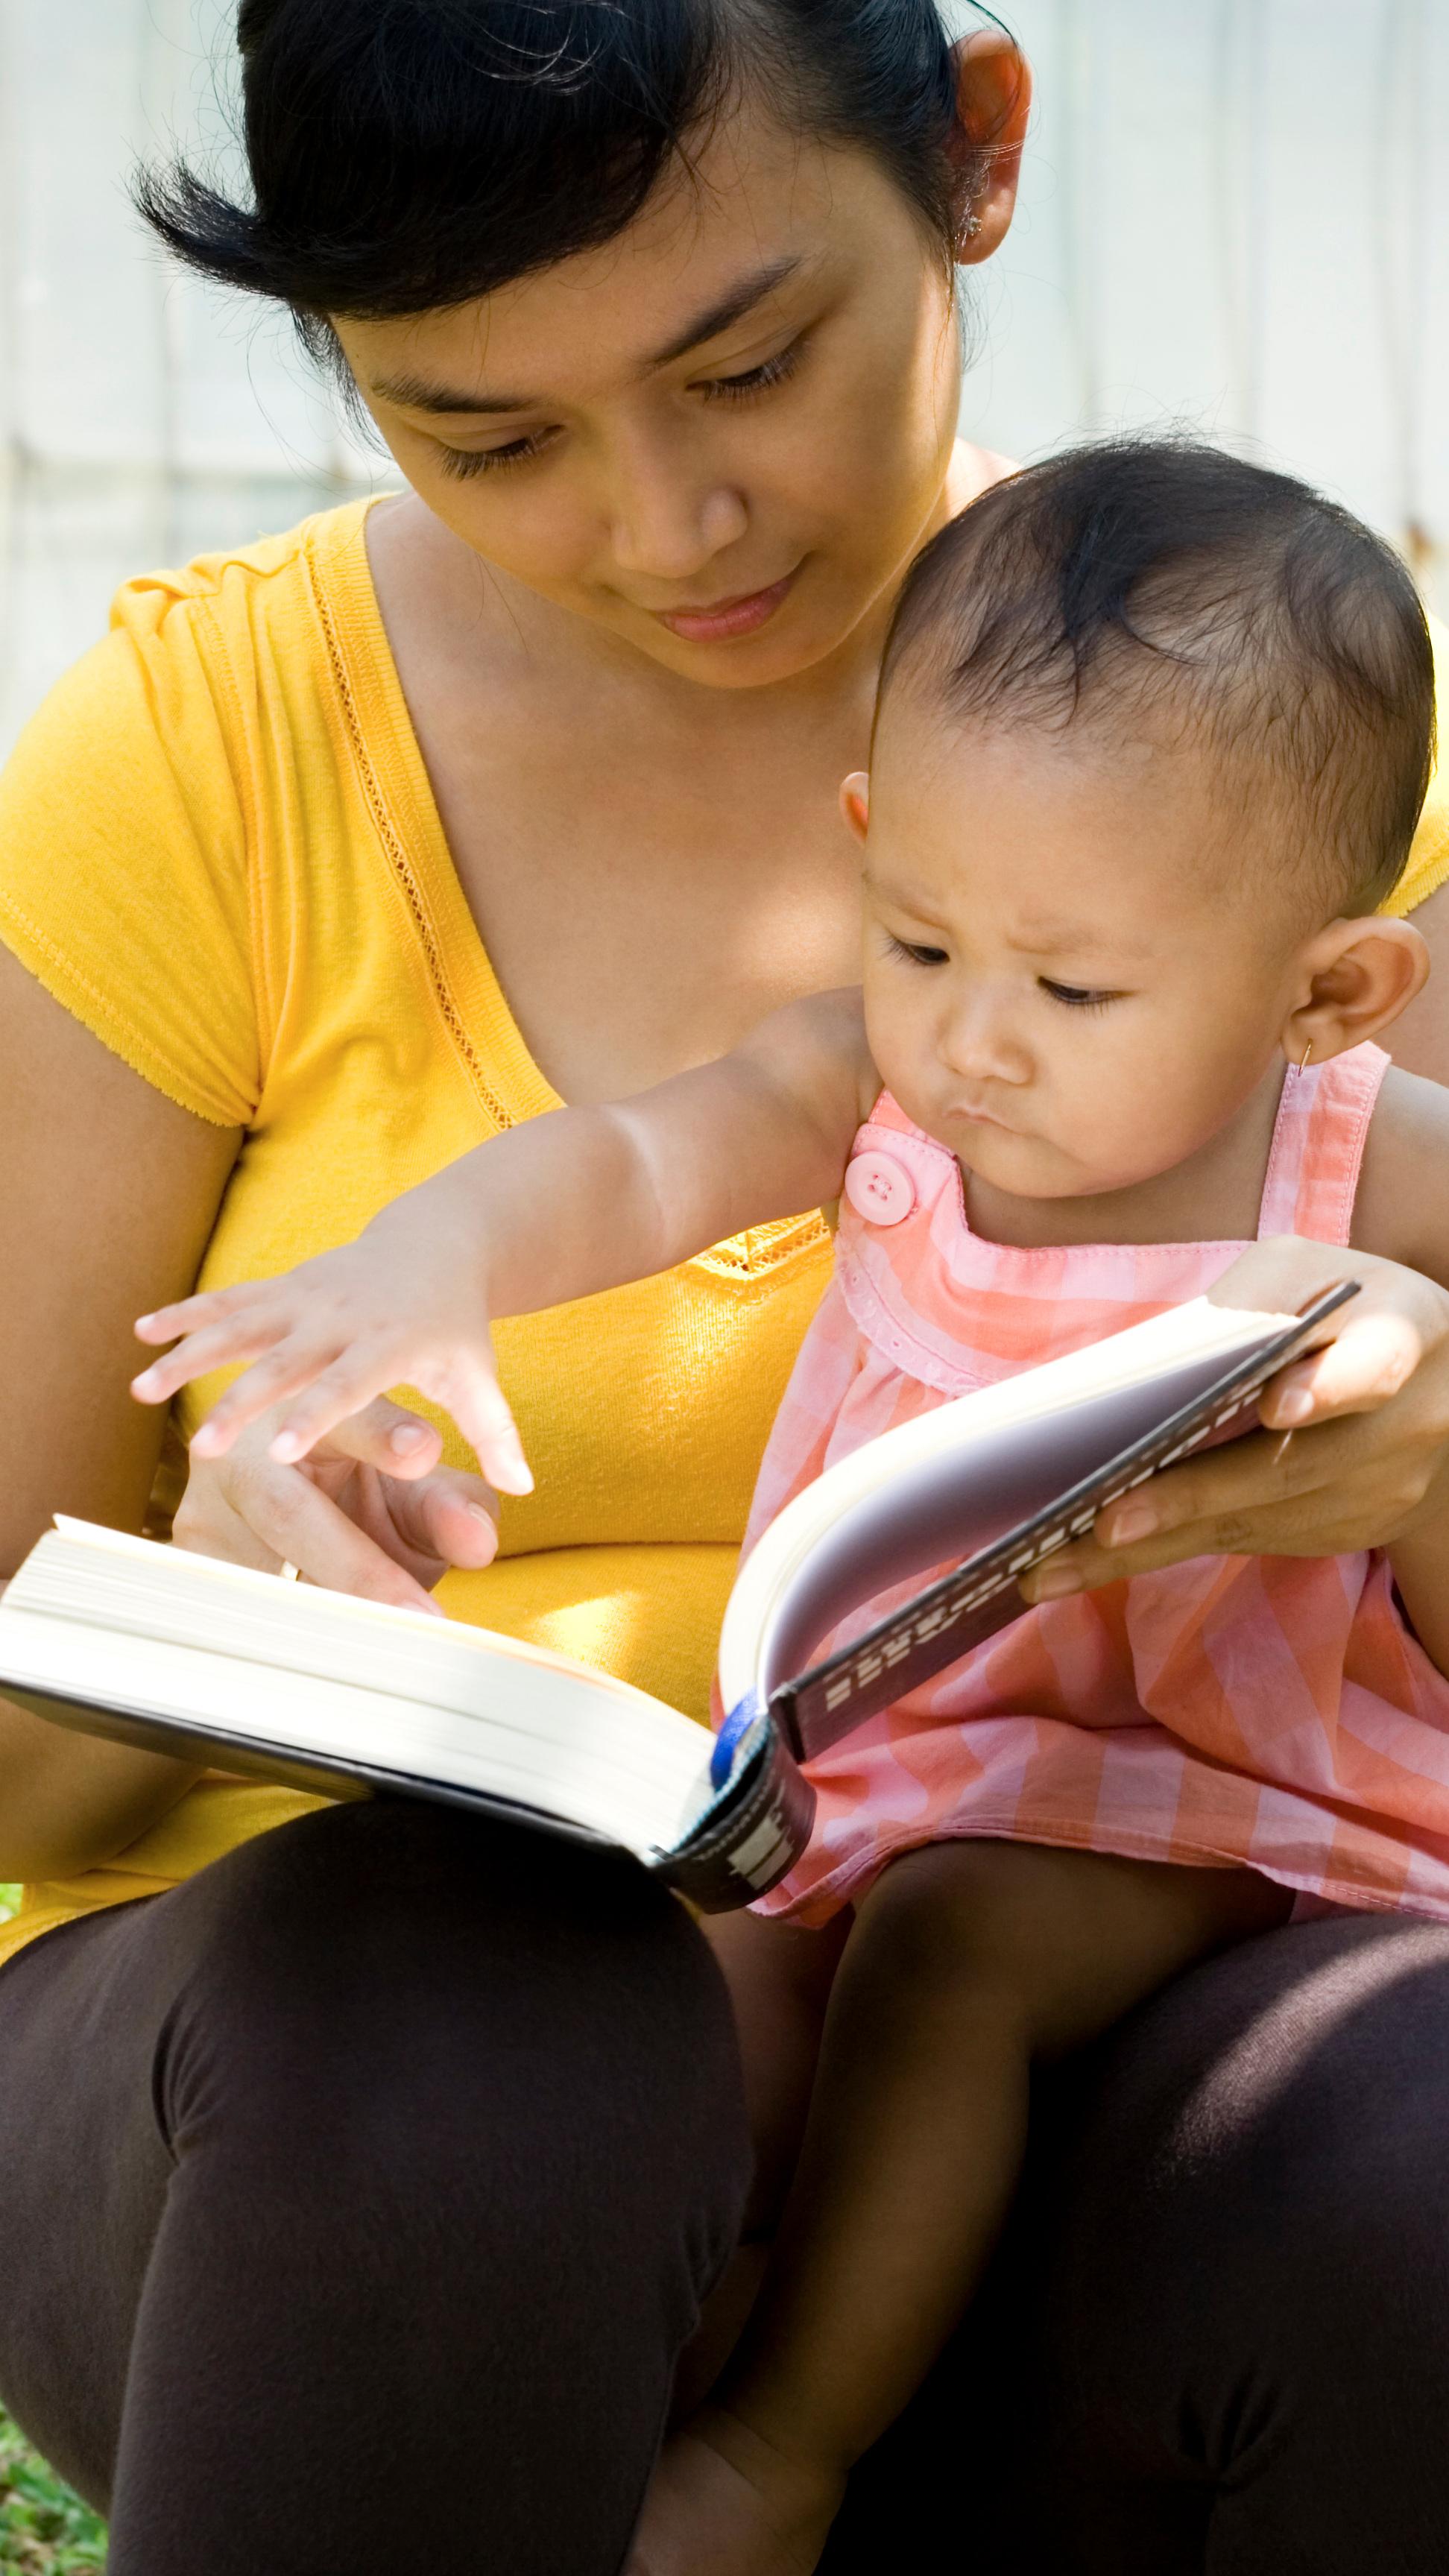 bigstock-Mother-Read-Book-and-Babysit-B-4156573.jpg